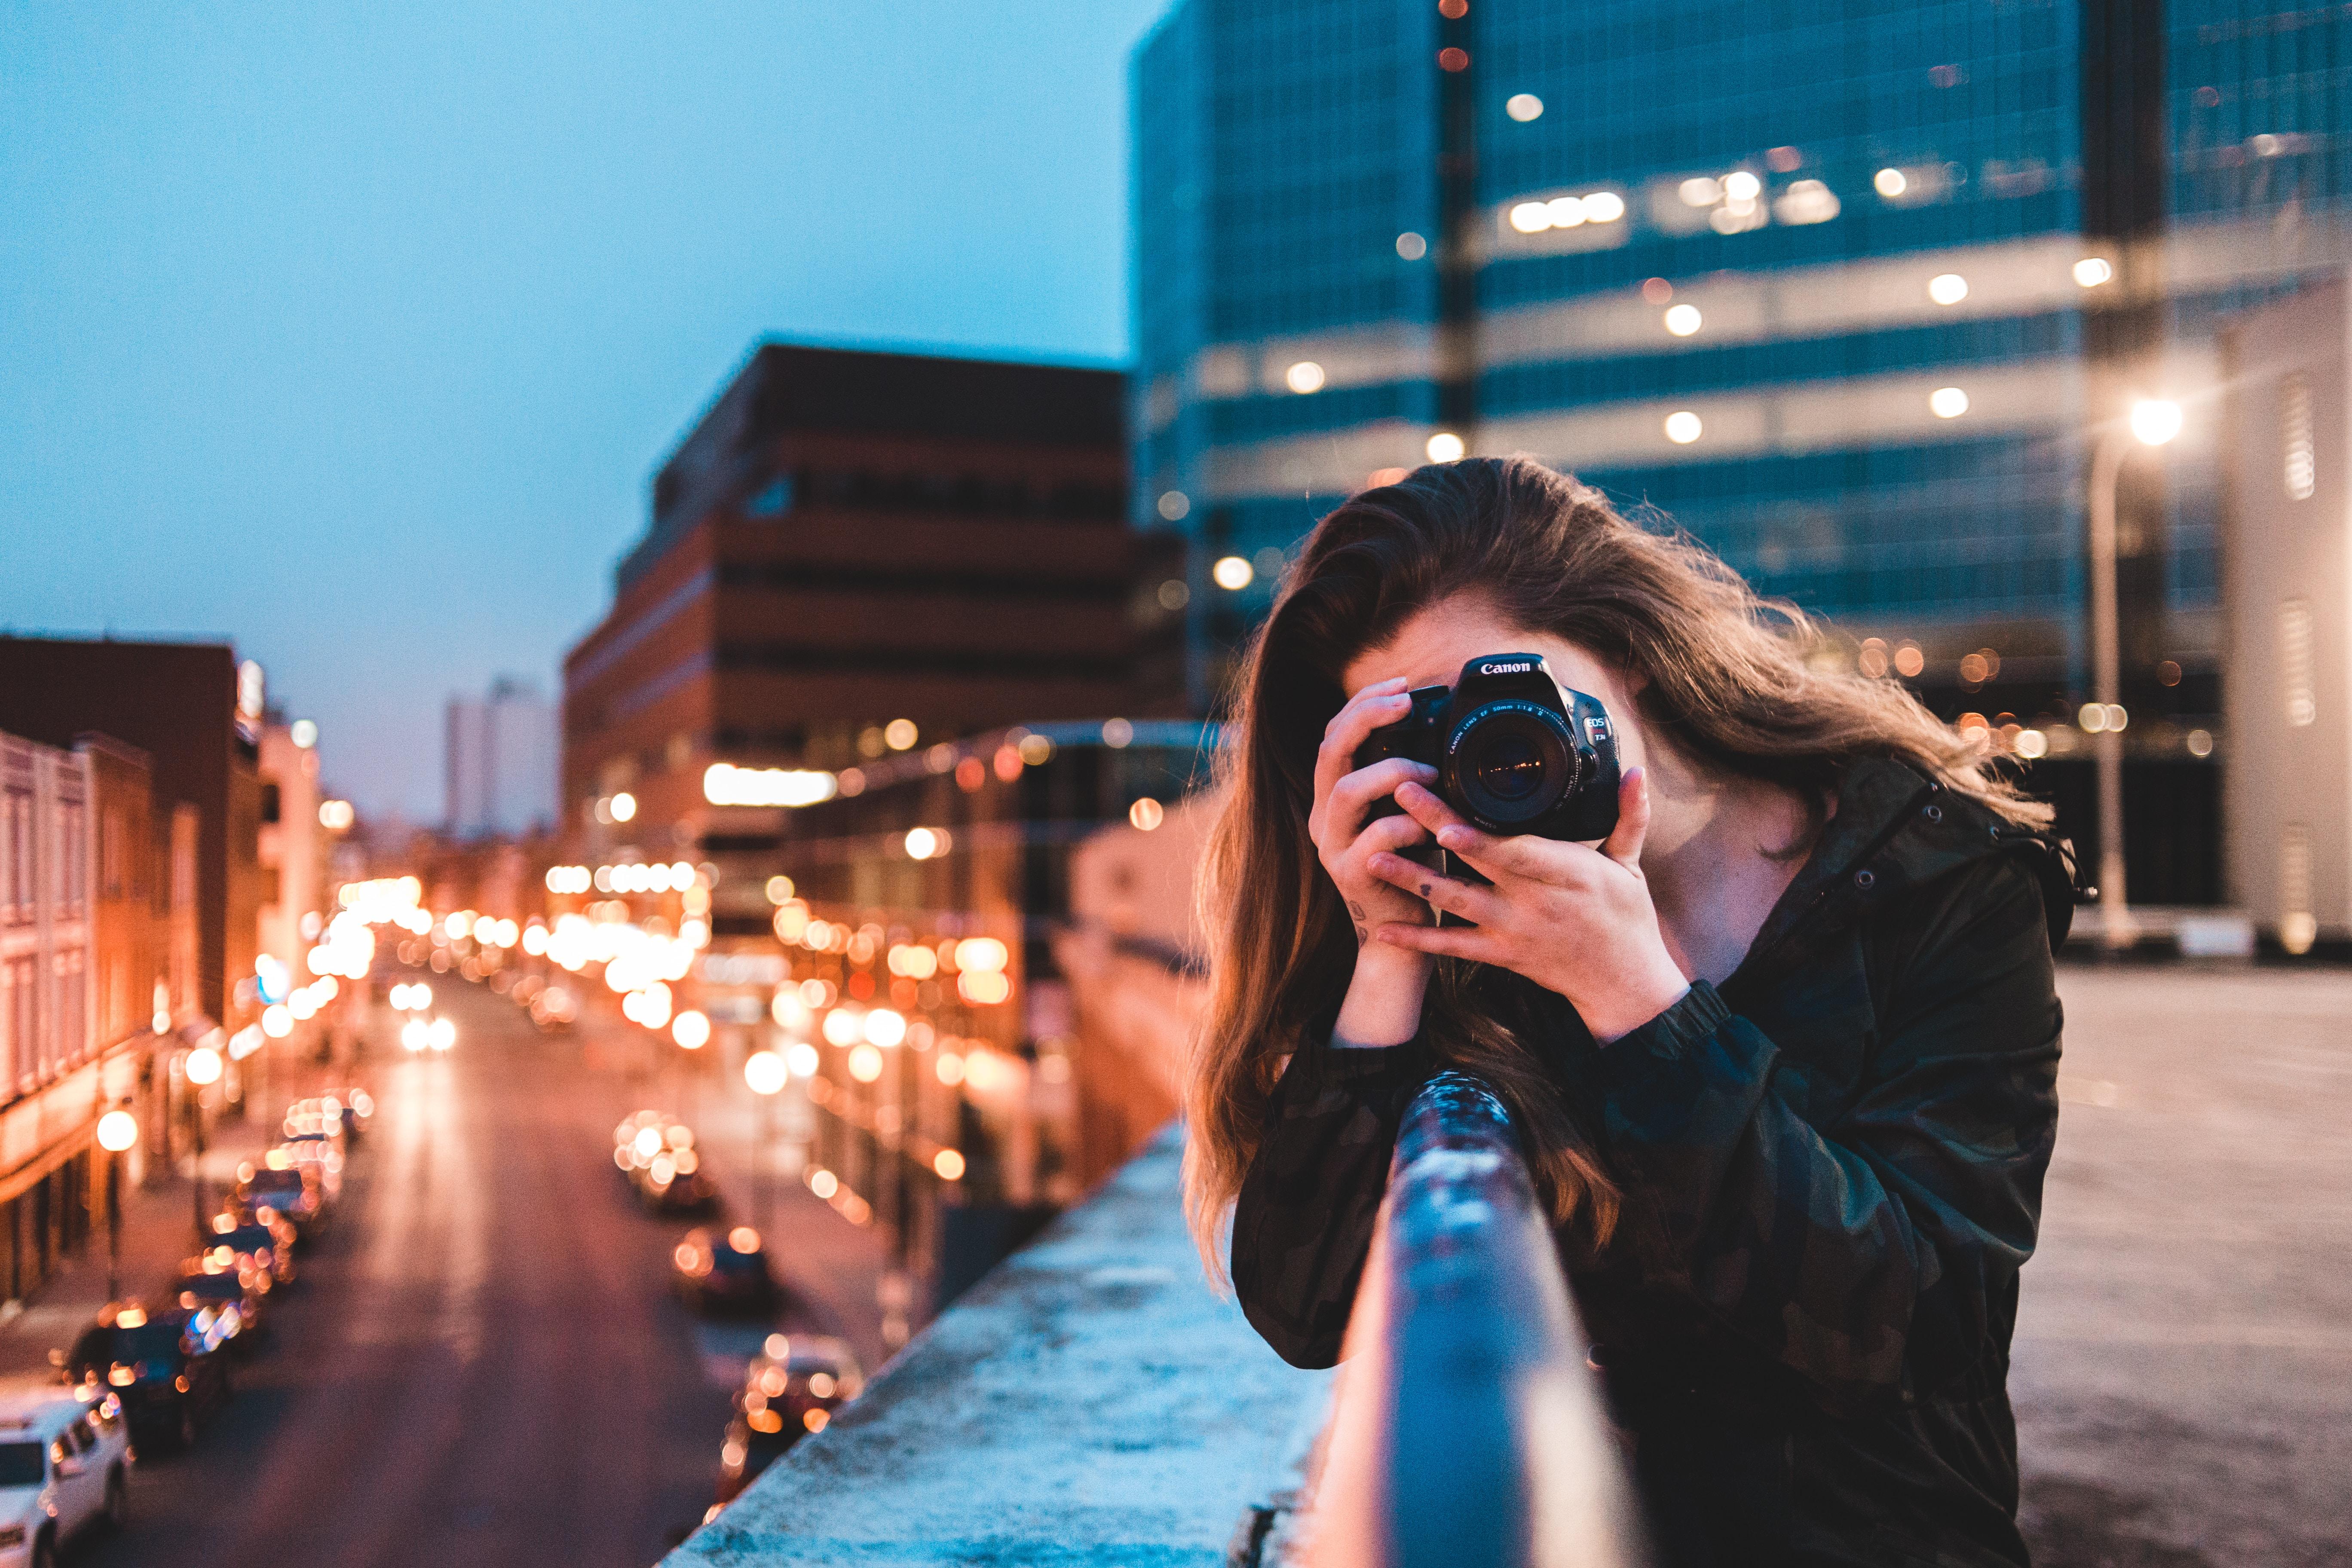 Women taking a photo.